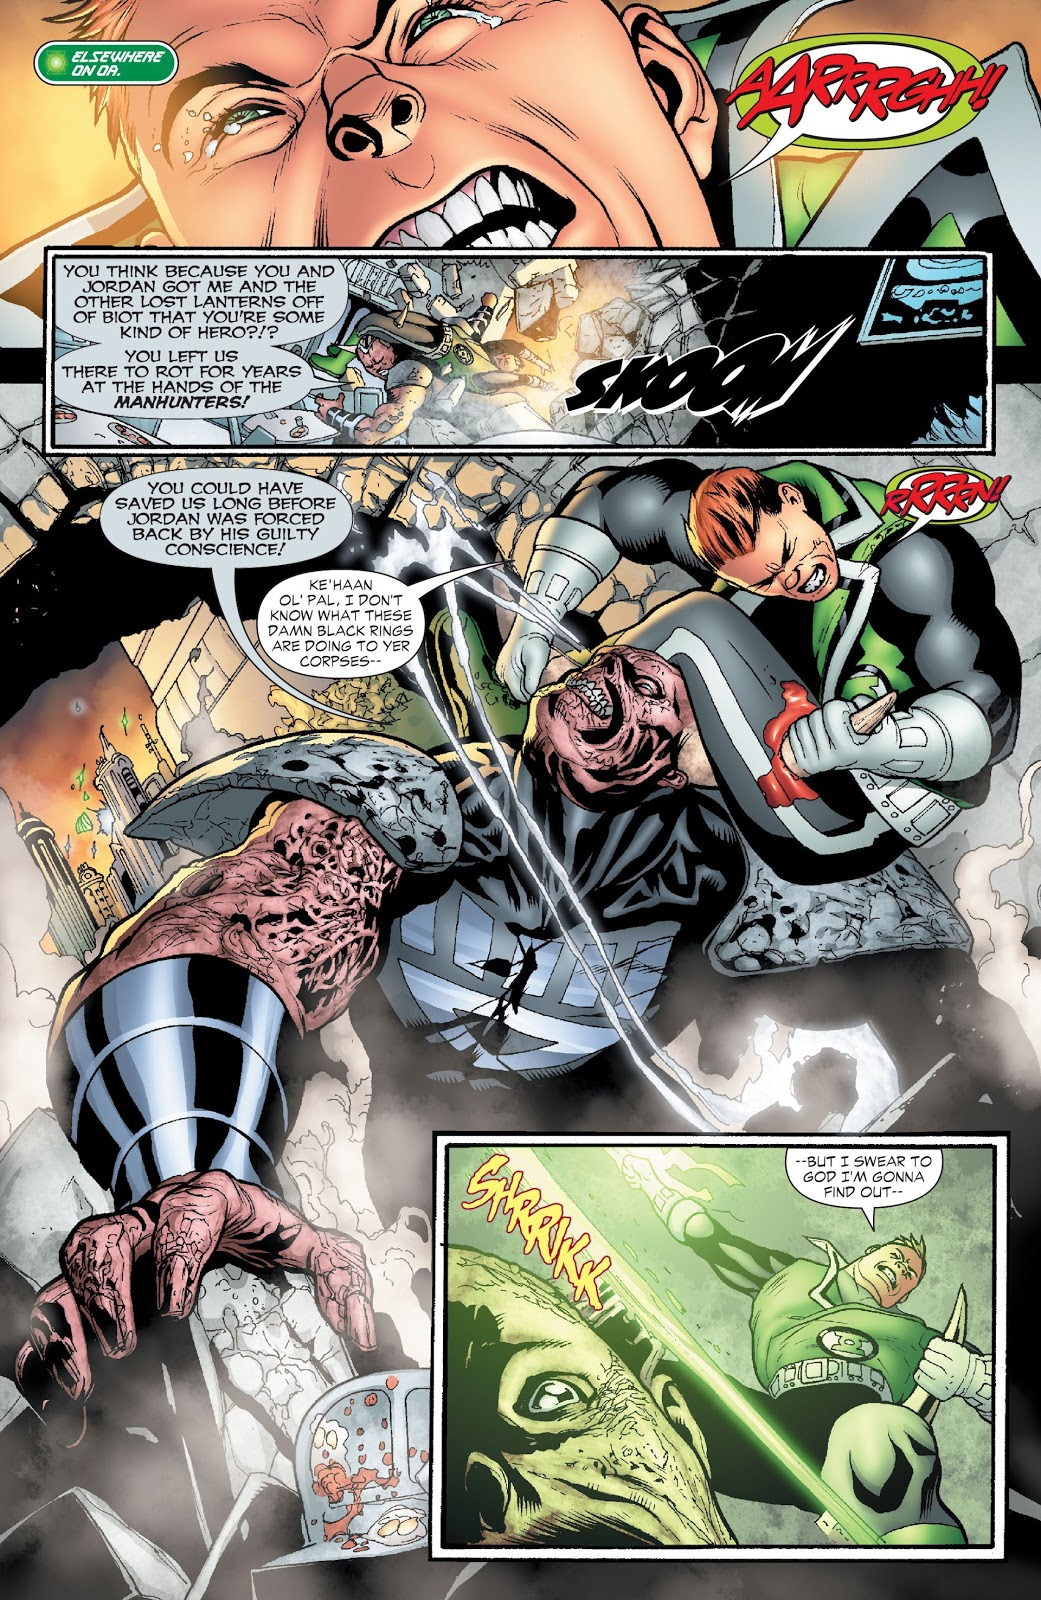 Green Lantern Corps Blackest Night review